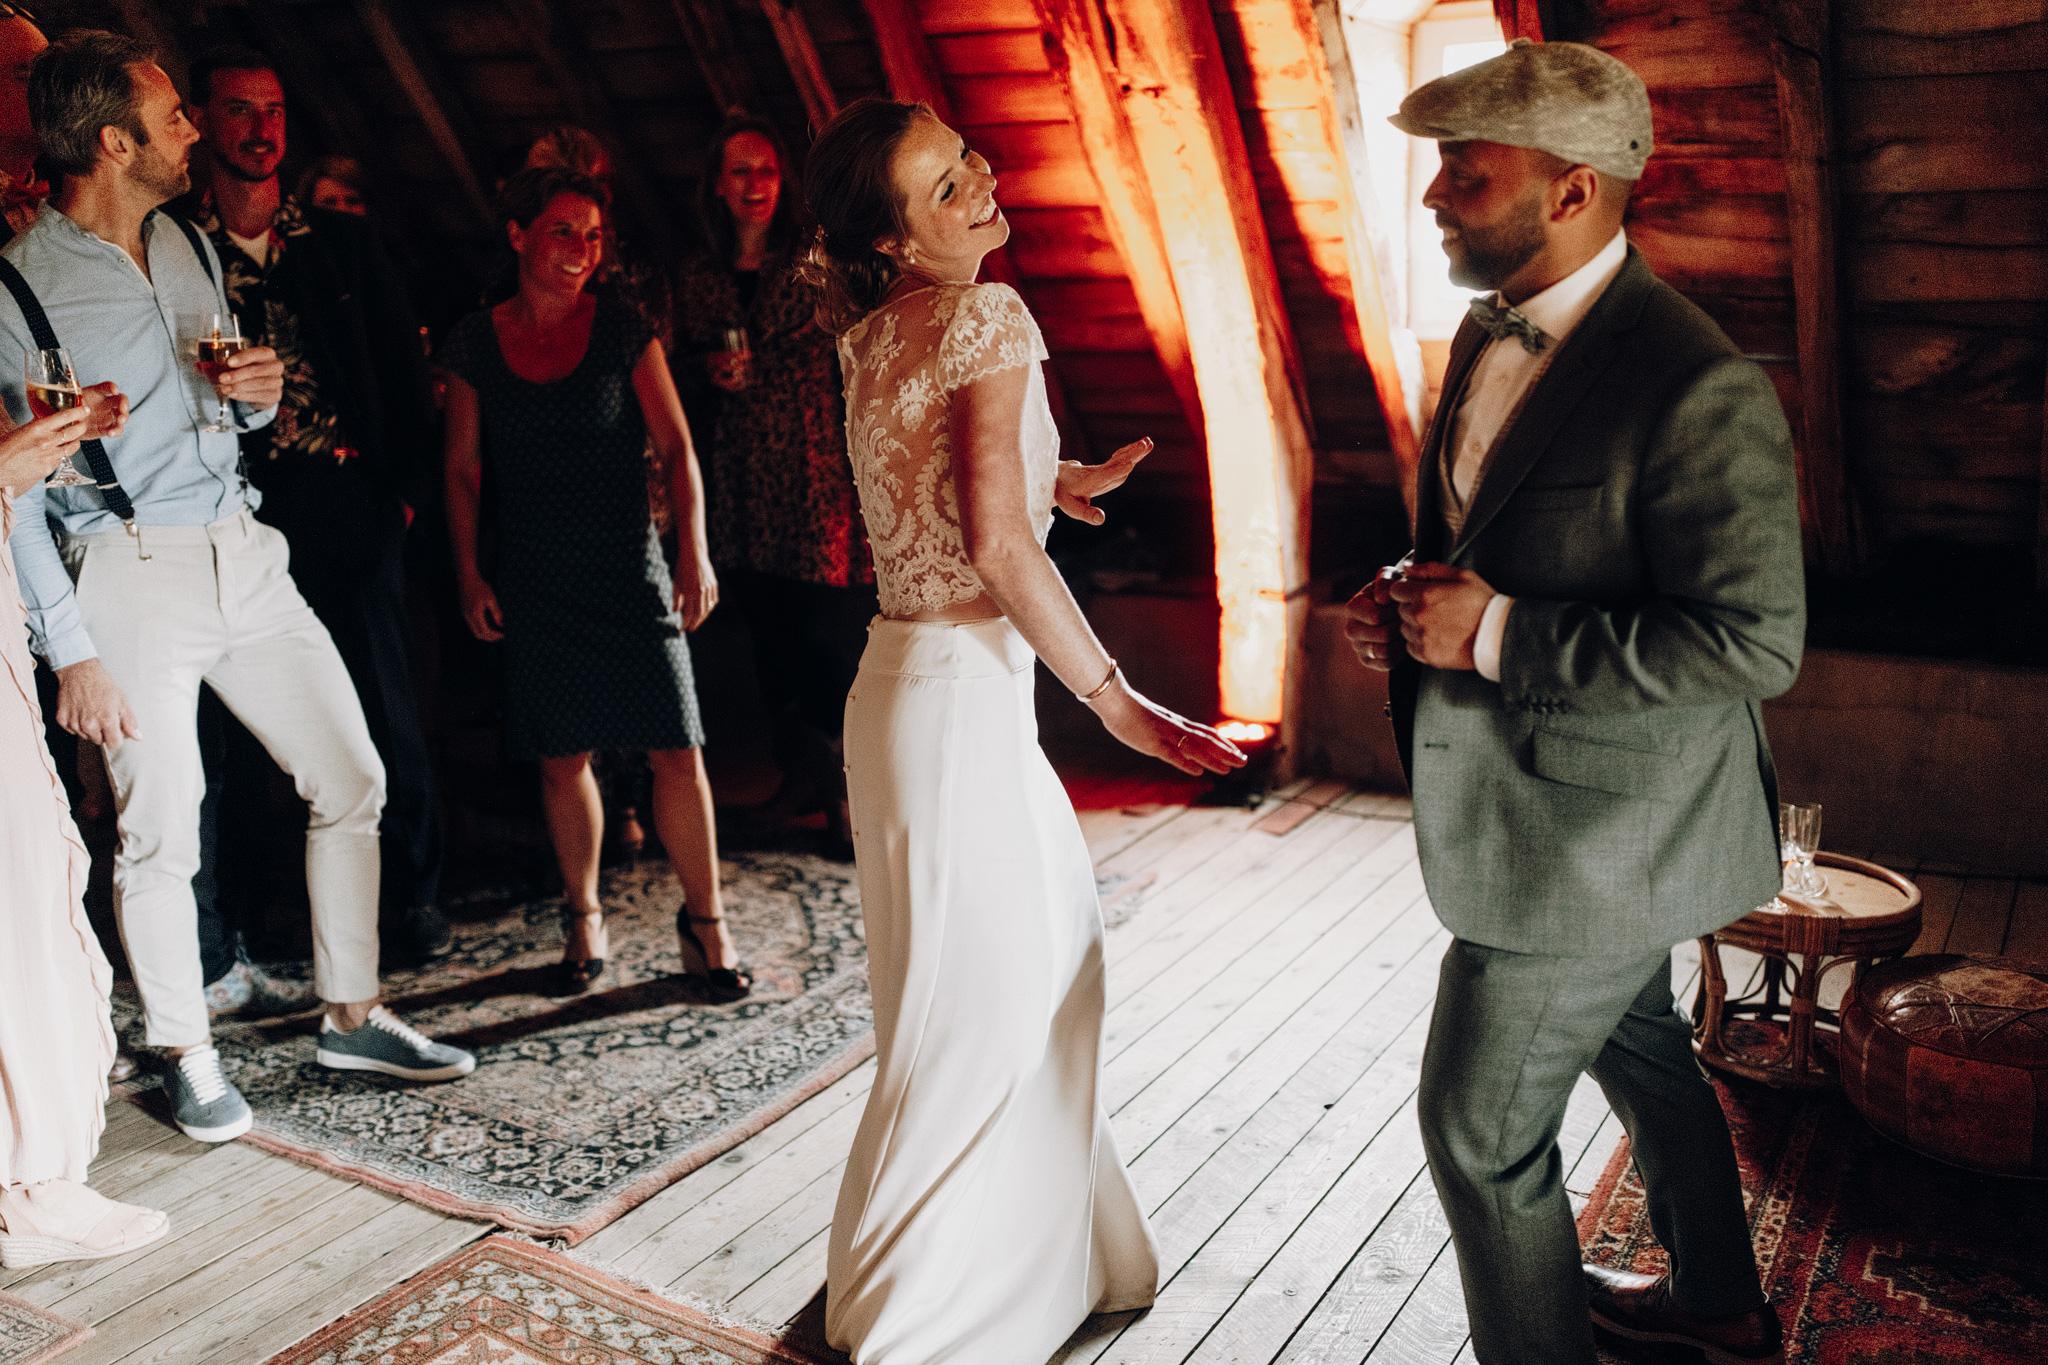 Bruid en bruidegom dansen bij Kloster Graefenthal